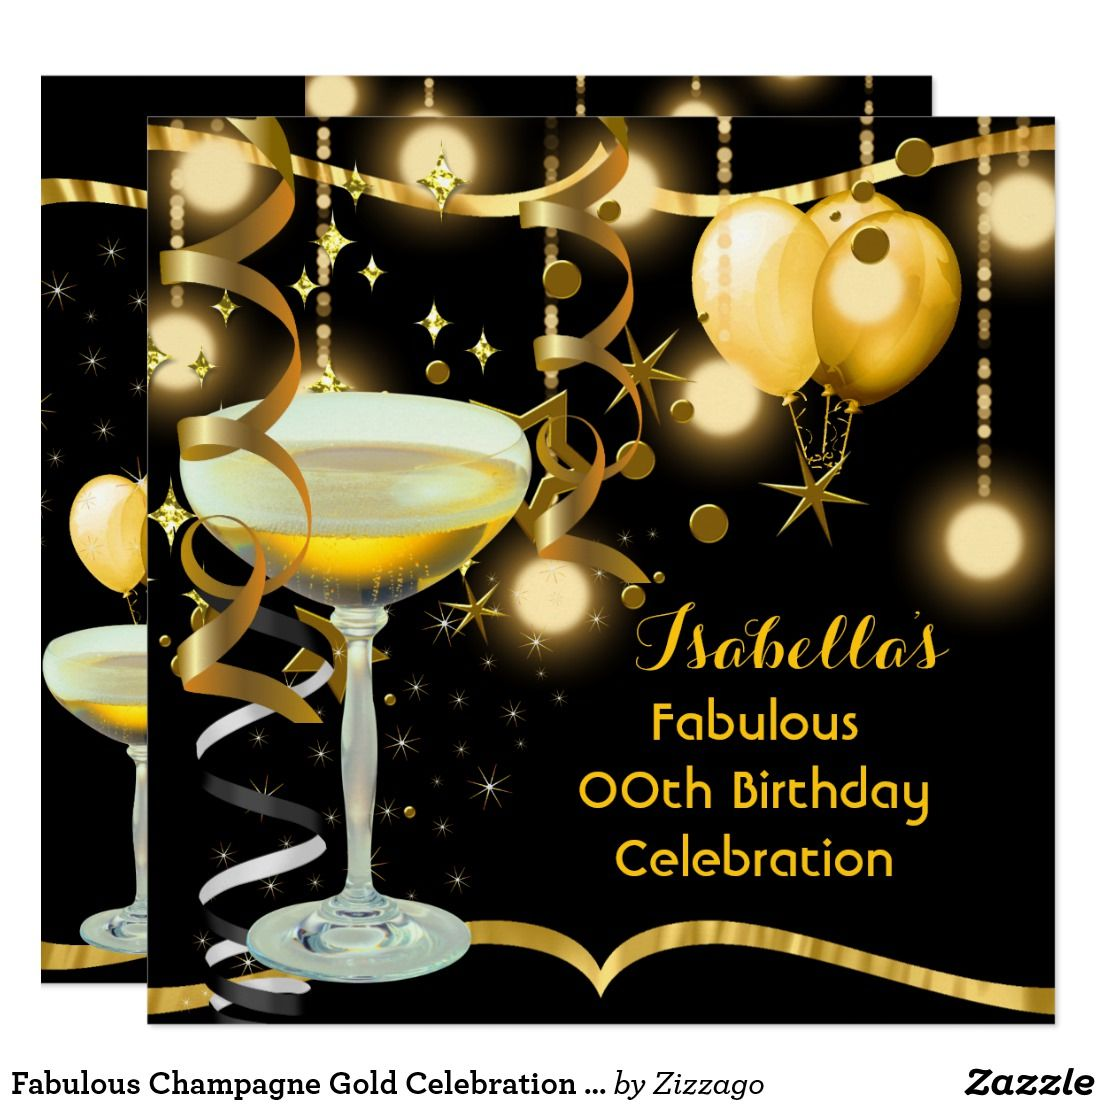 Fabulous Champagne Gold Celebration Party Invitation   Zazzle.com   Gold  celebration, Birthday shots, Fun birthday party